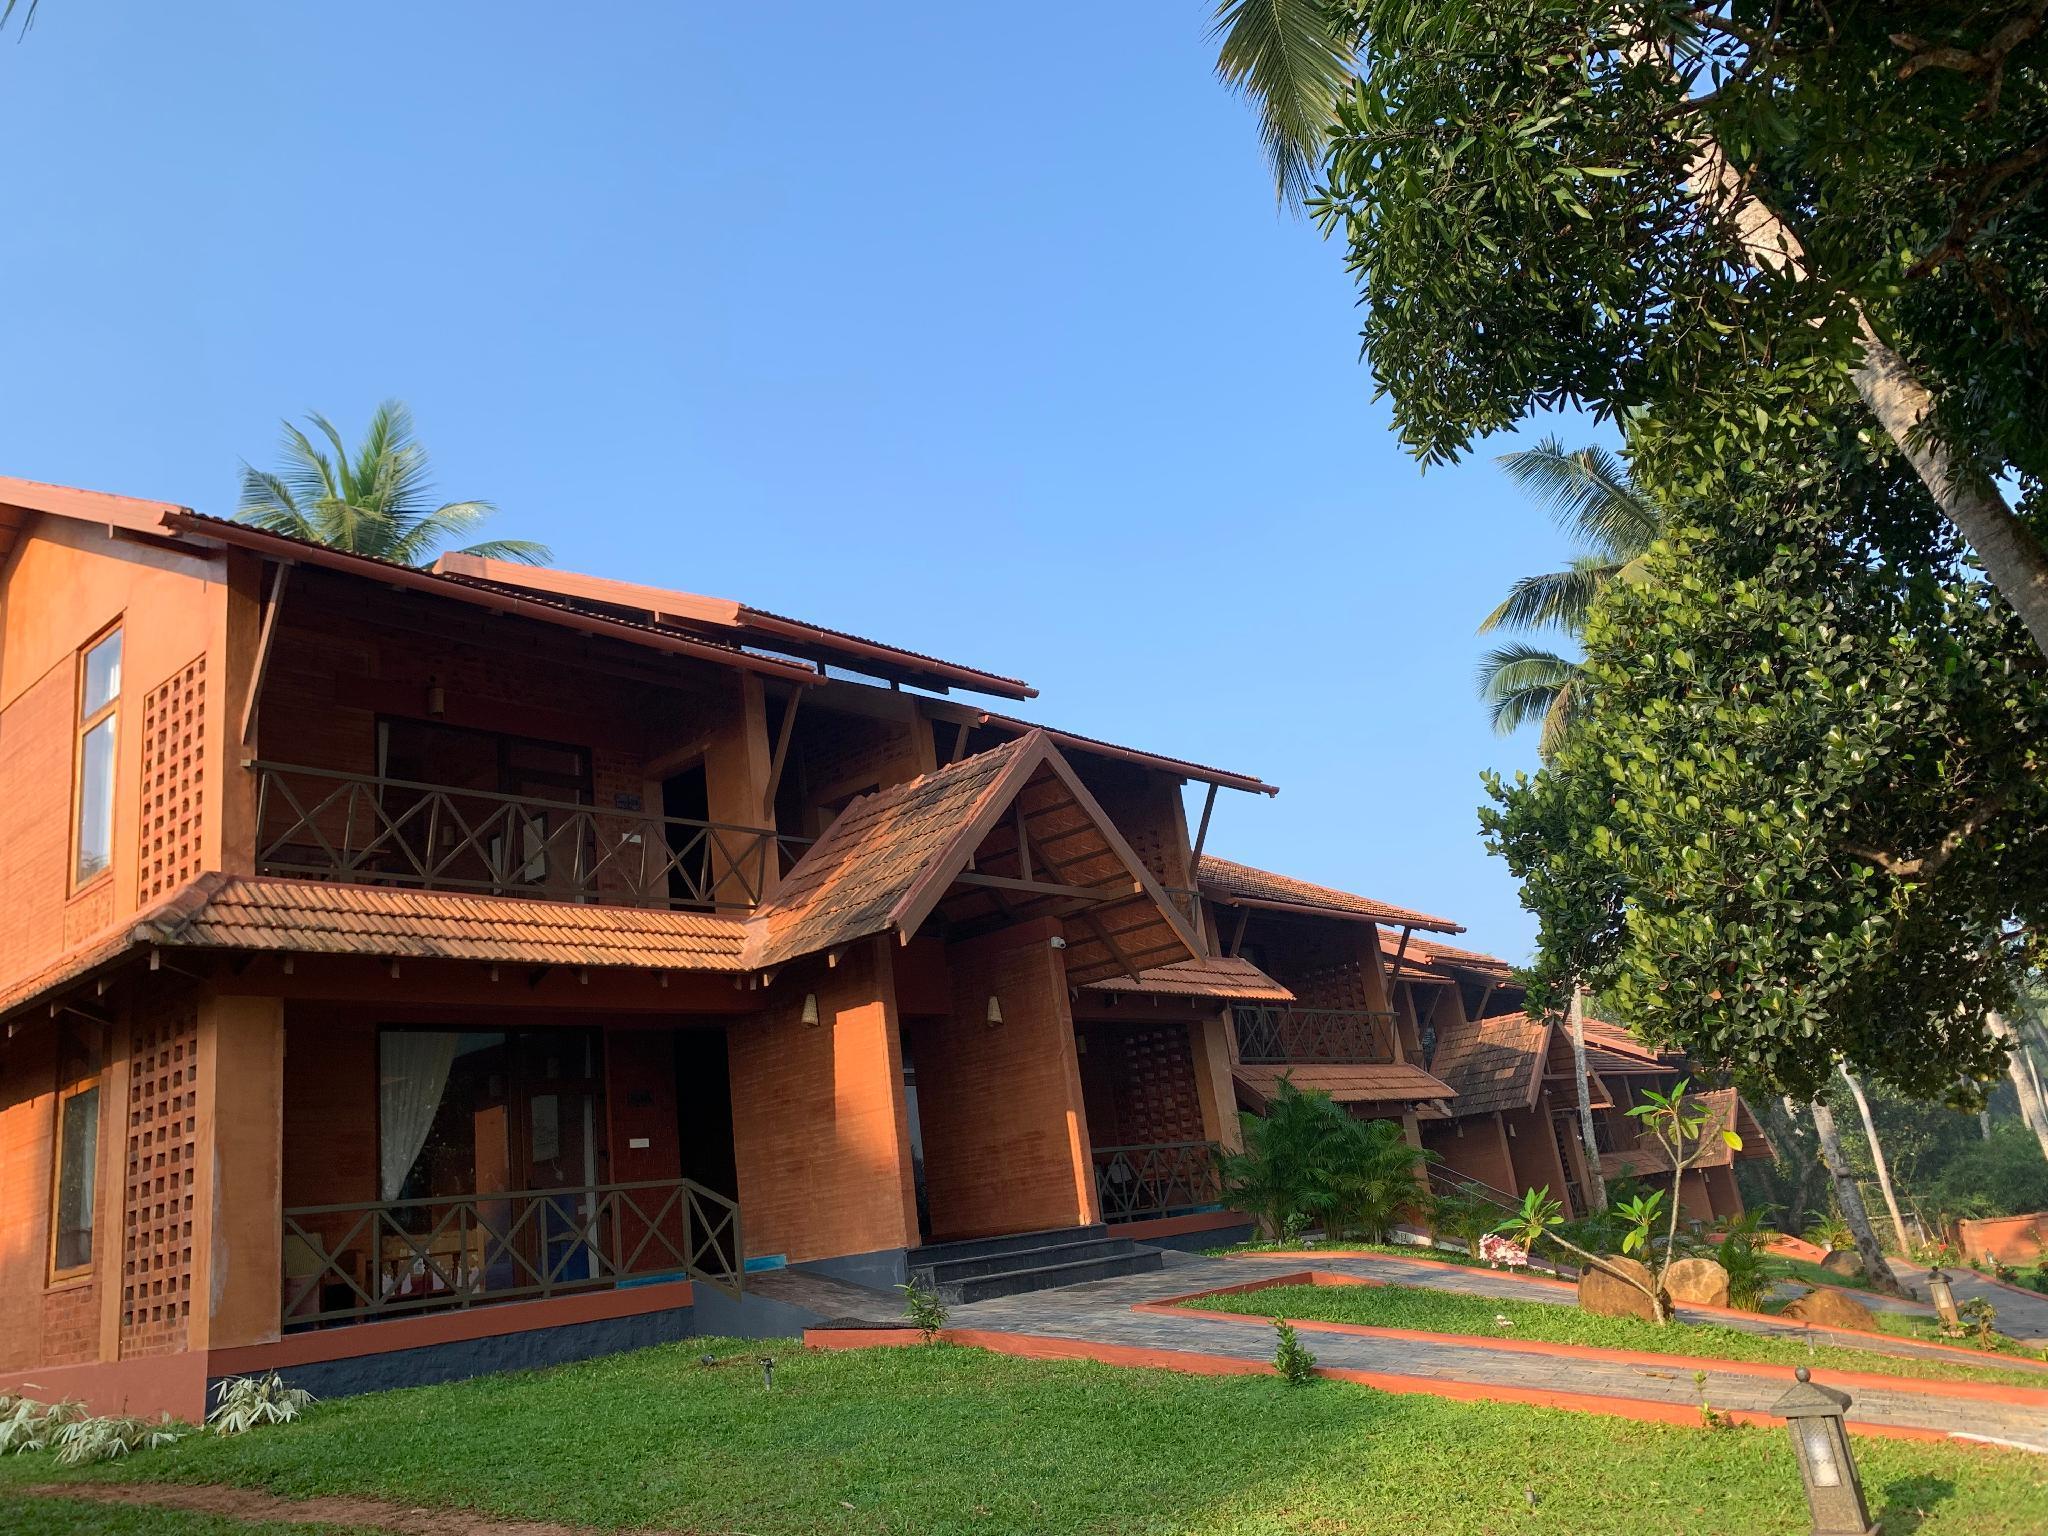 Amara Ayurveda Retreat